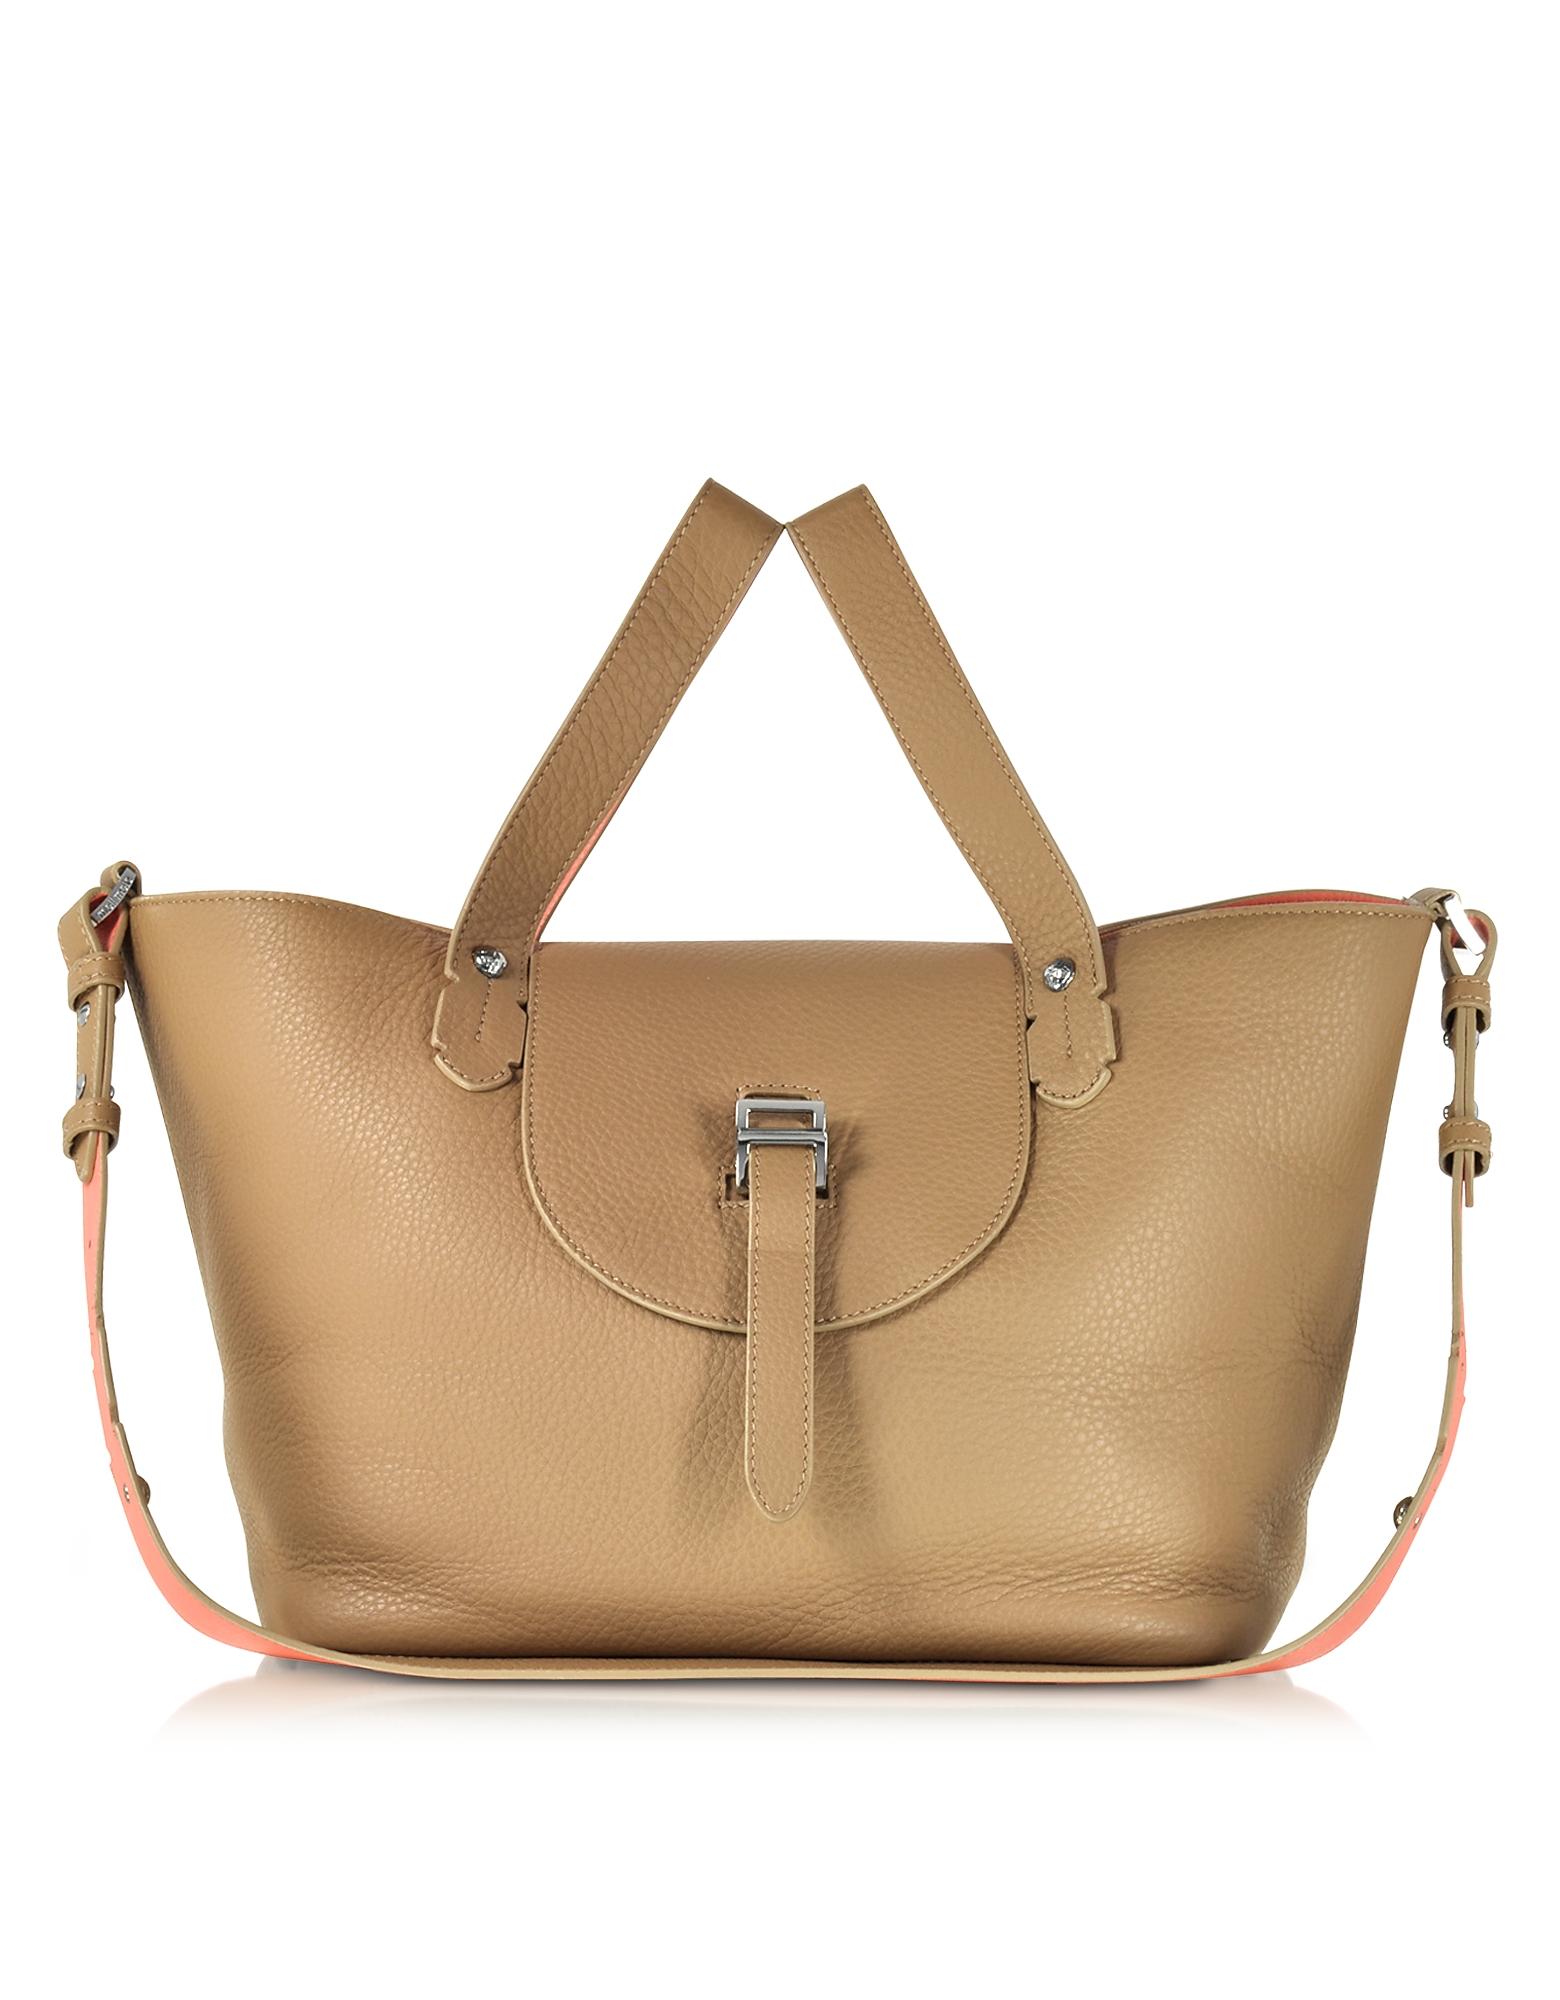 Meli Melo Handbags, Light Tan and Persimonio Leather Thela Medium Tote Bag